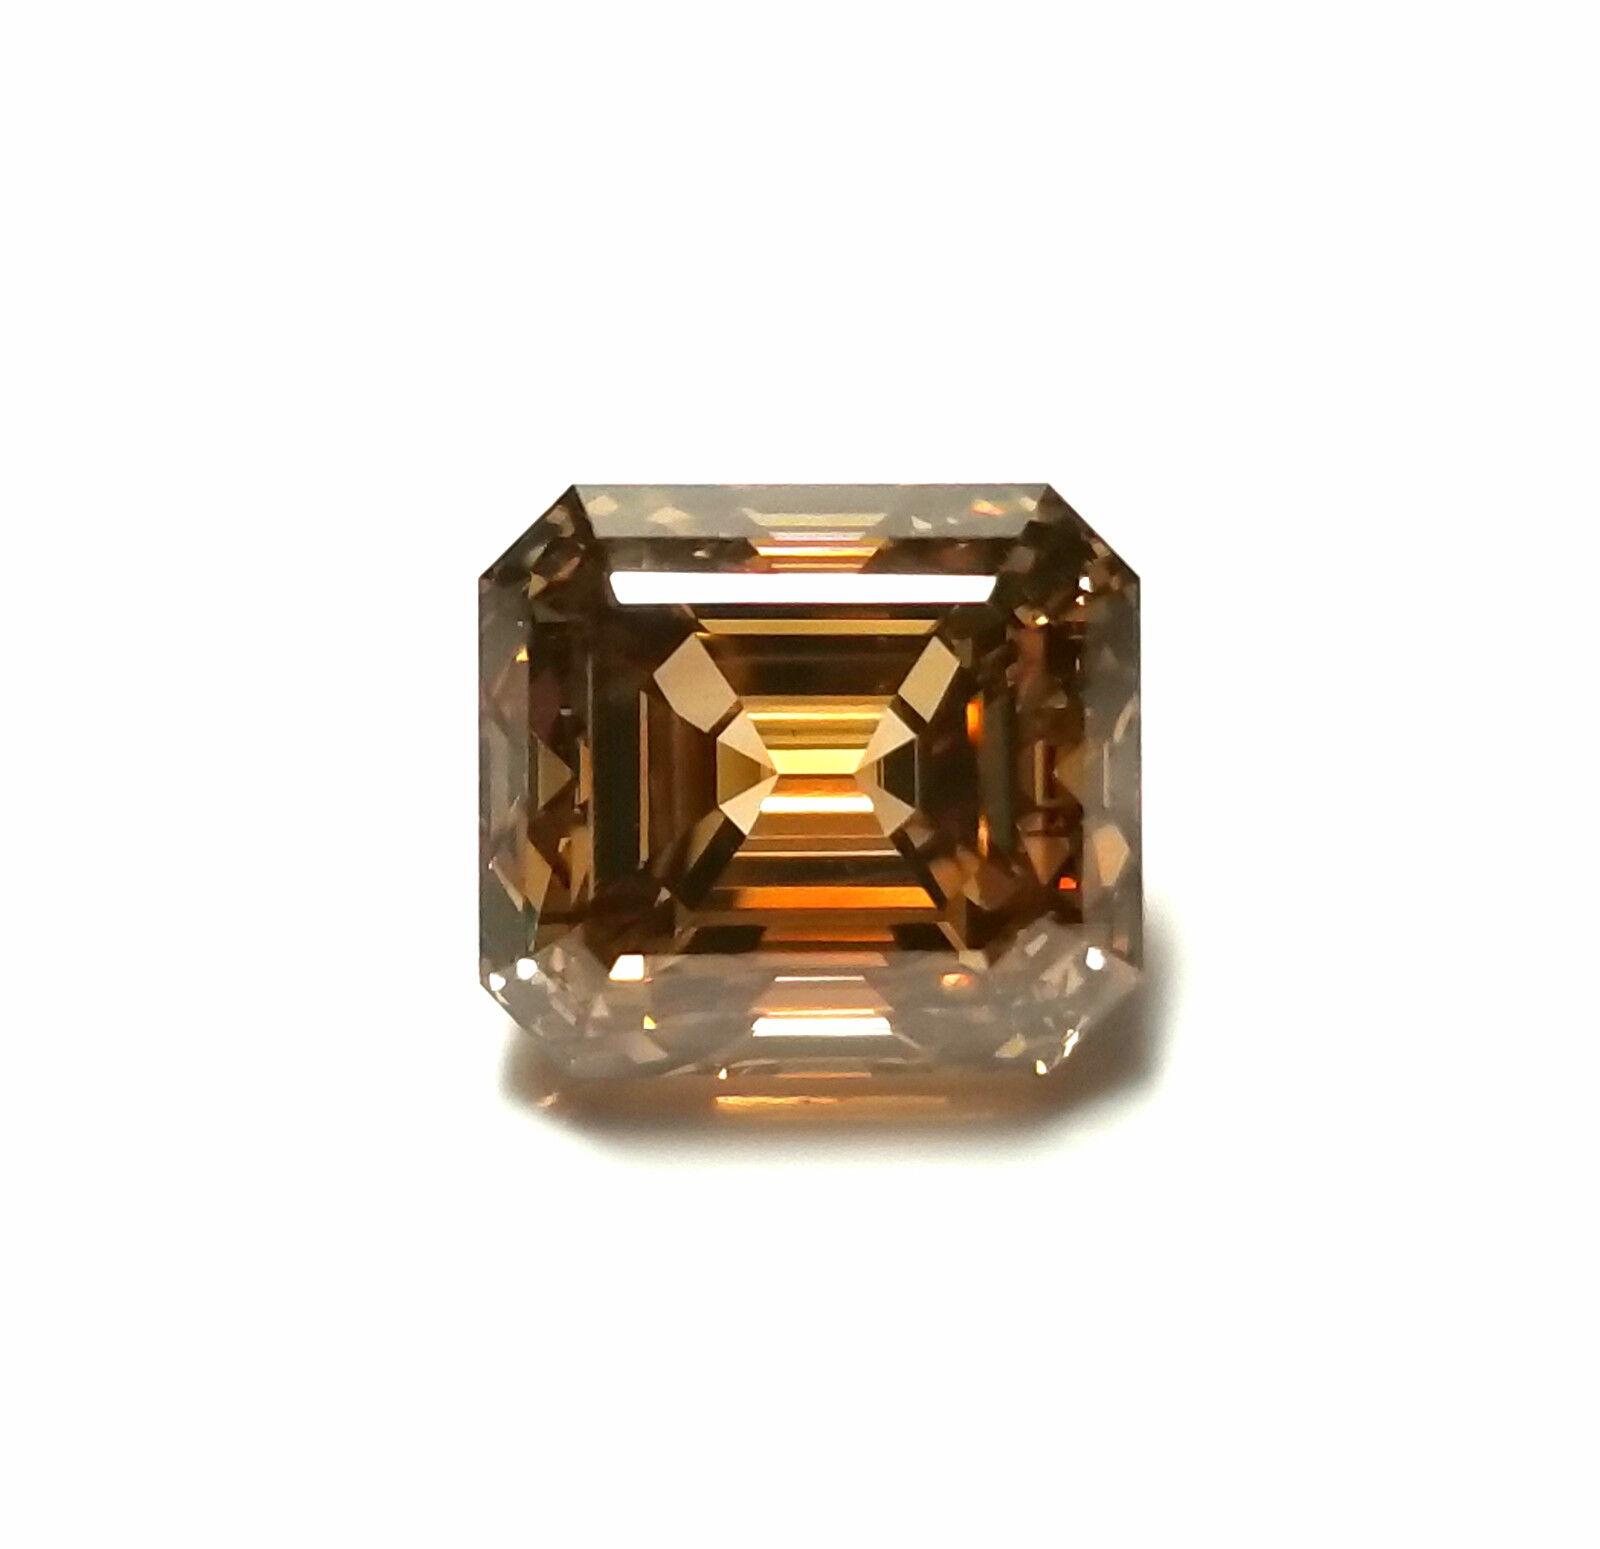 2.69ct Natural Loose Fancy Yellow Brown Diamond Emerald Asscher Cut GIA Argyle